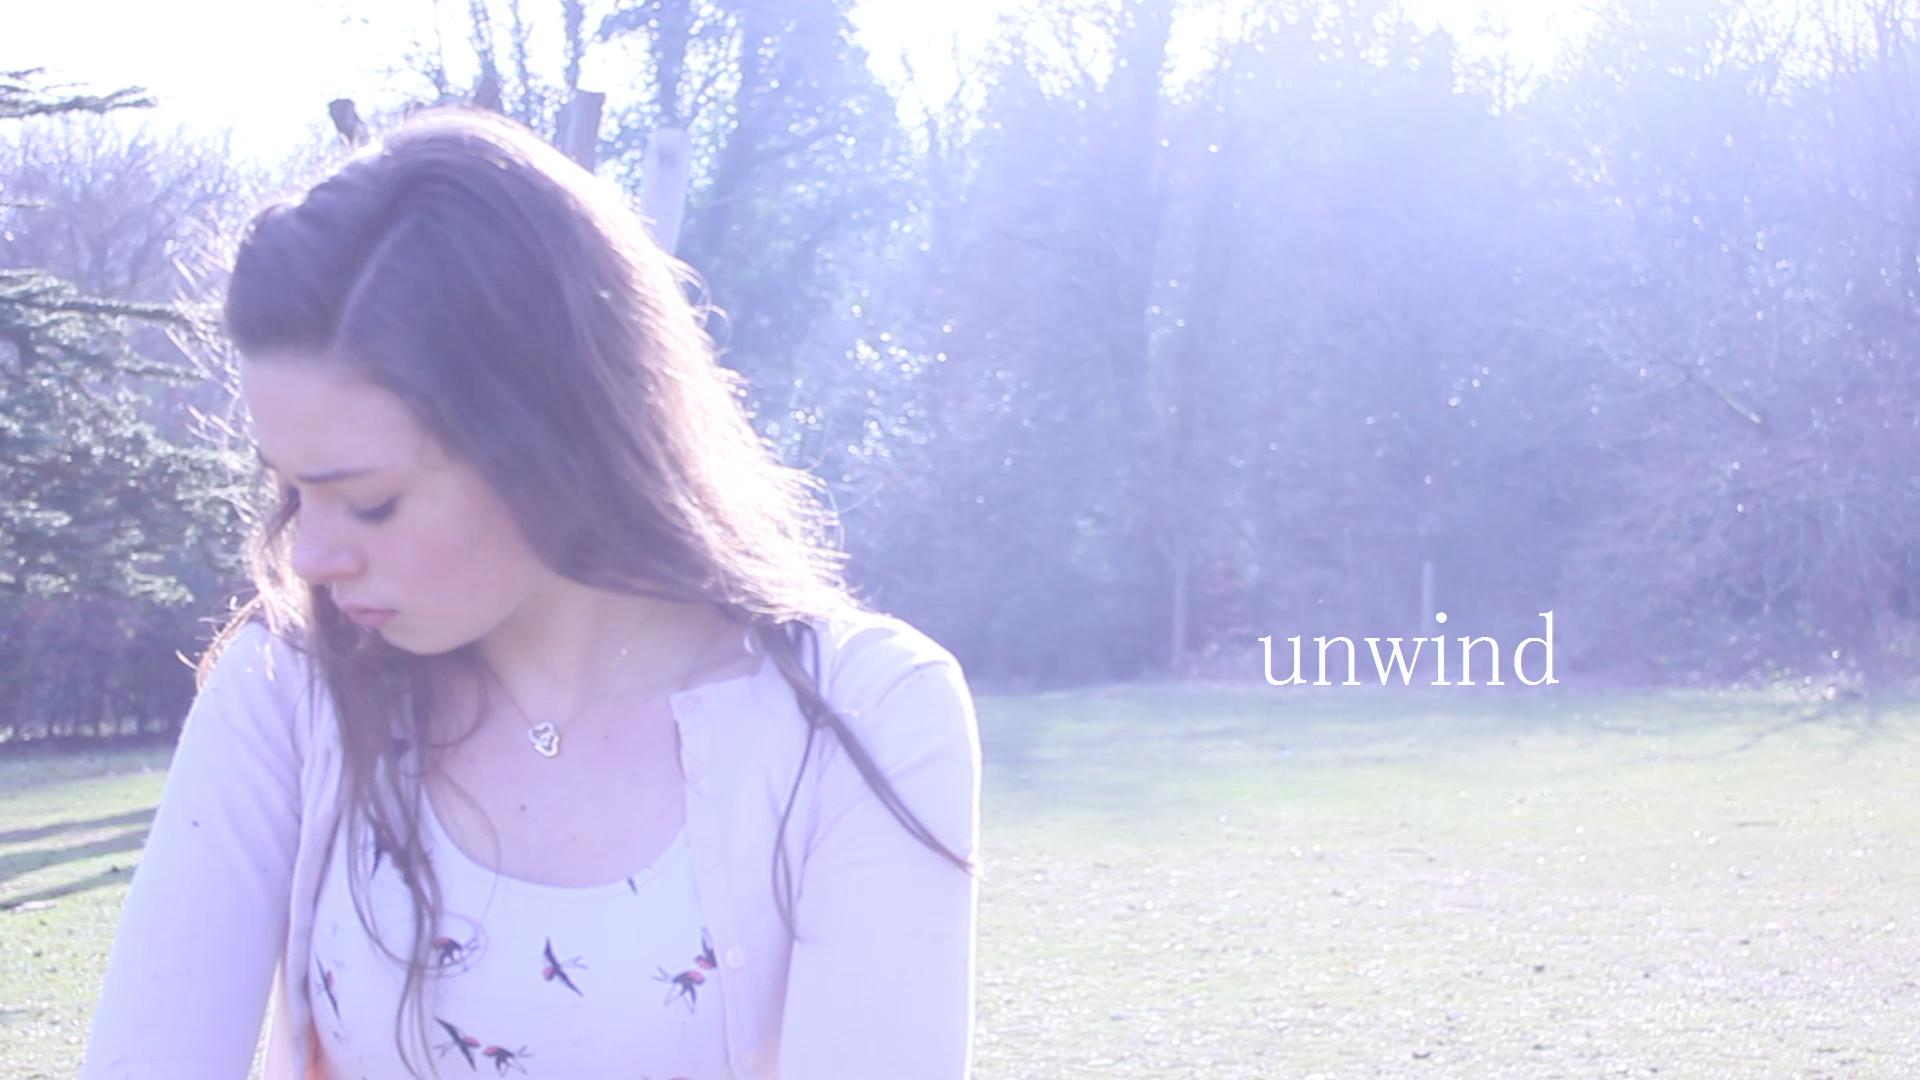 Unwind poster